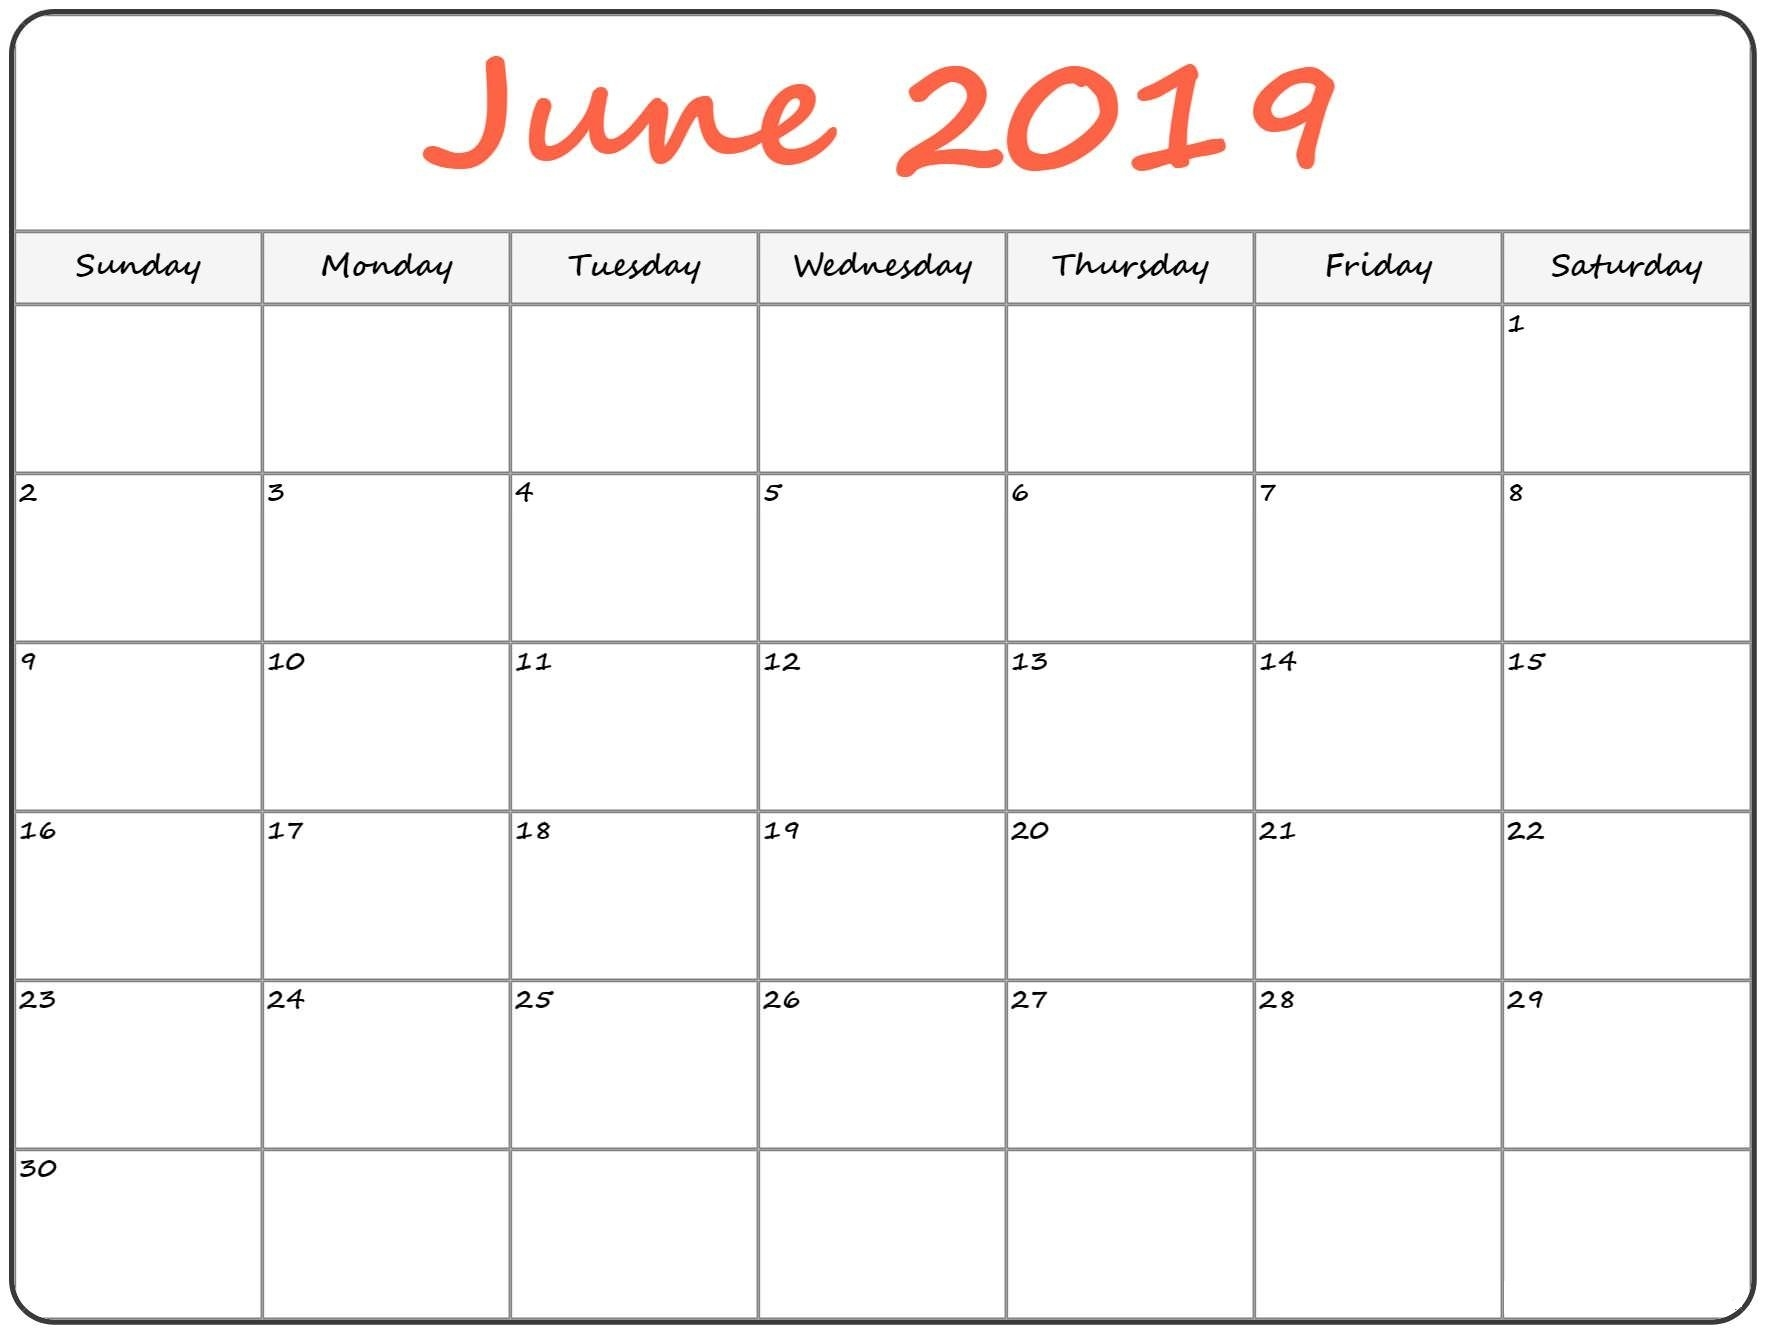 June 2019 Holiday Blank Calendar Download - Printable Calendar 2018 Calendar 2019 Monthly Printable With Holidays